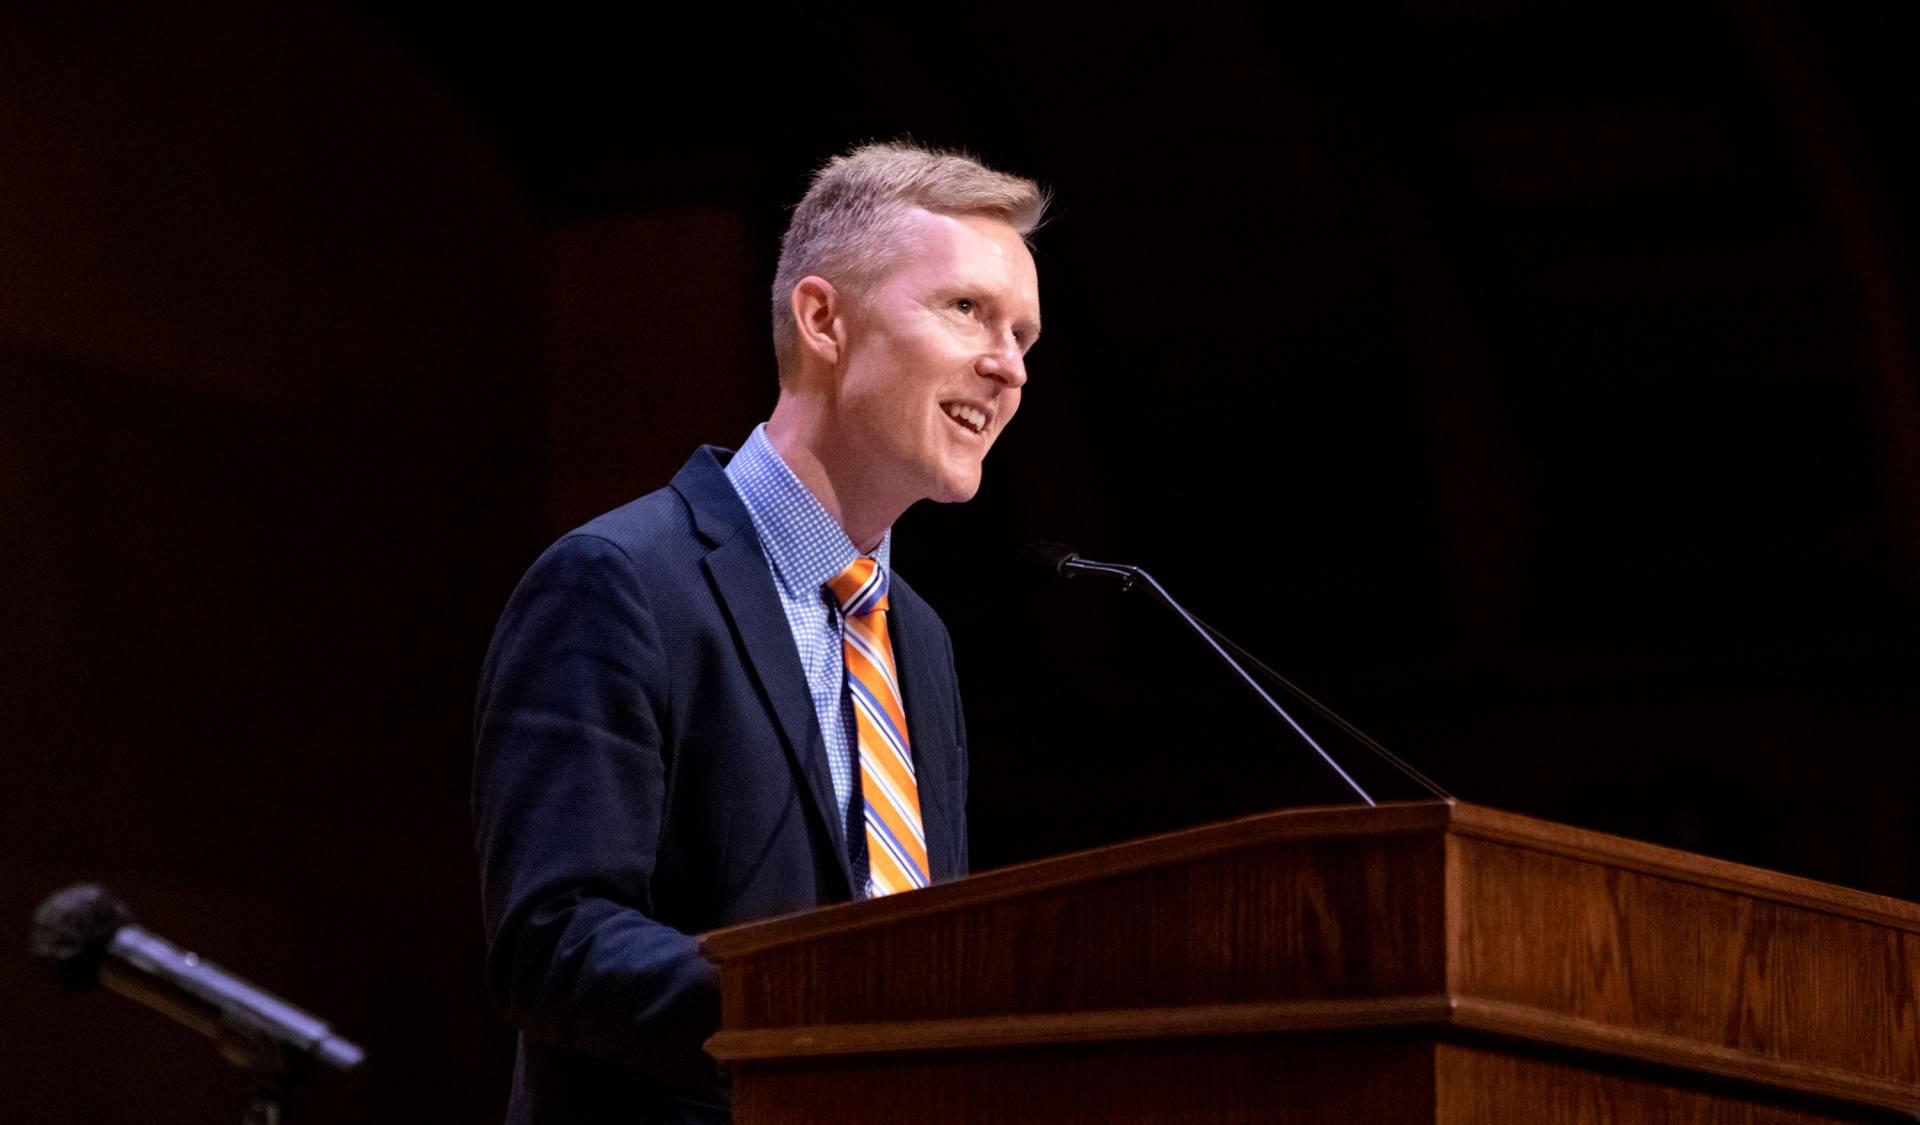 Cole Crittenden addresses graduate students